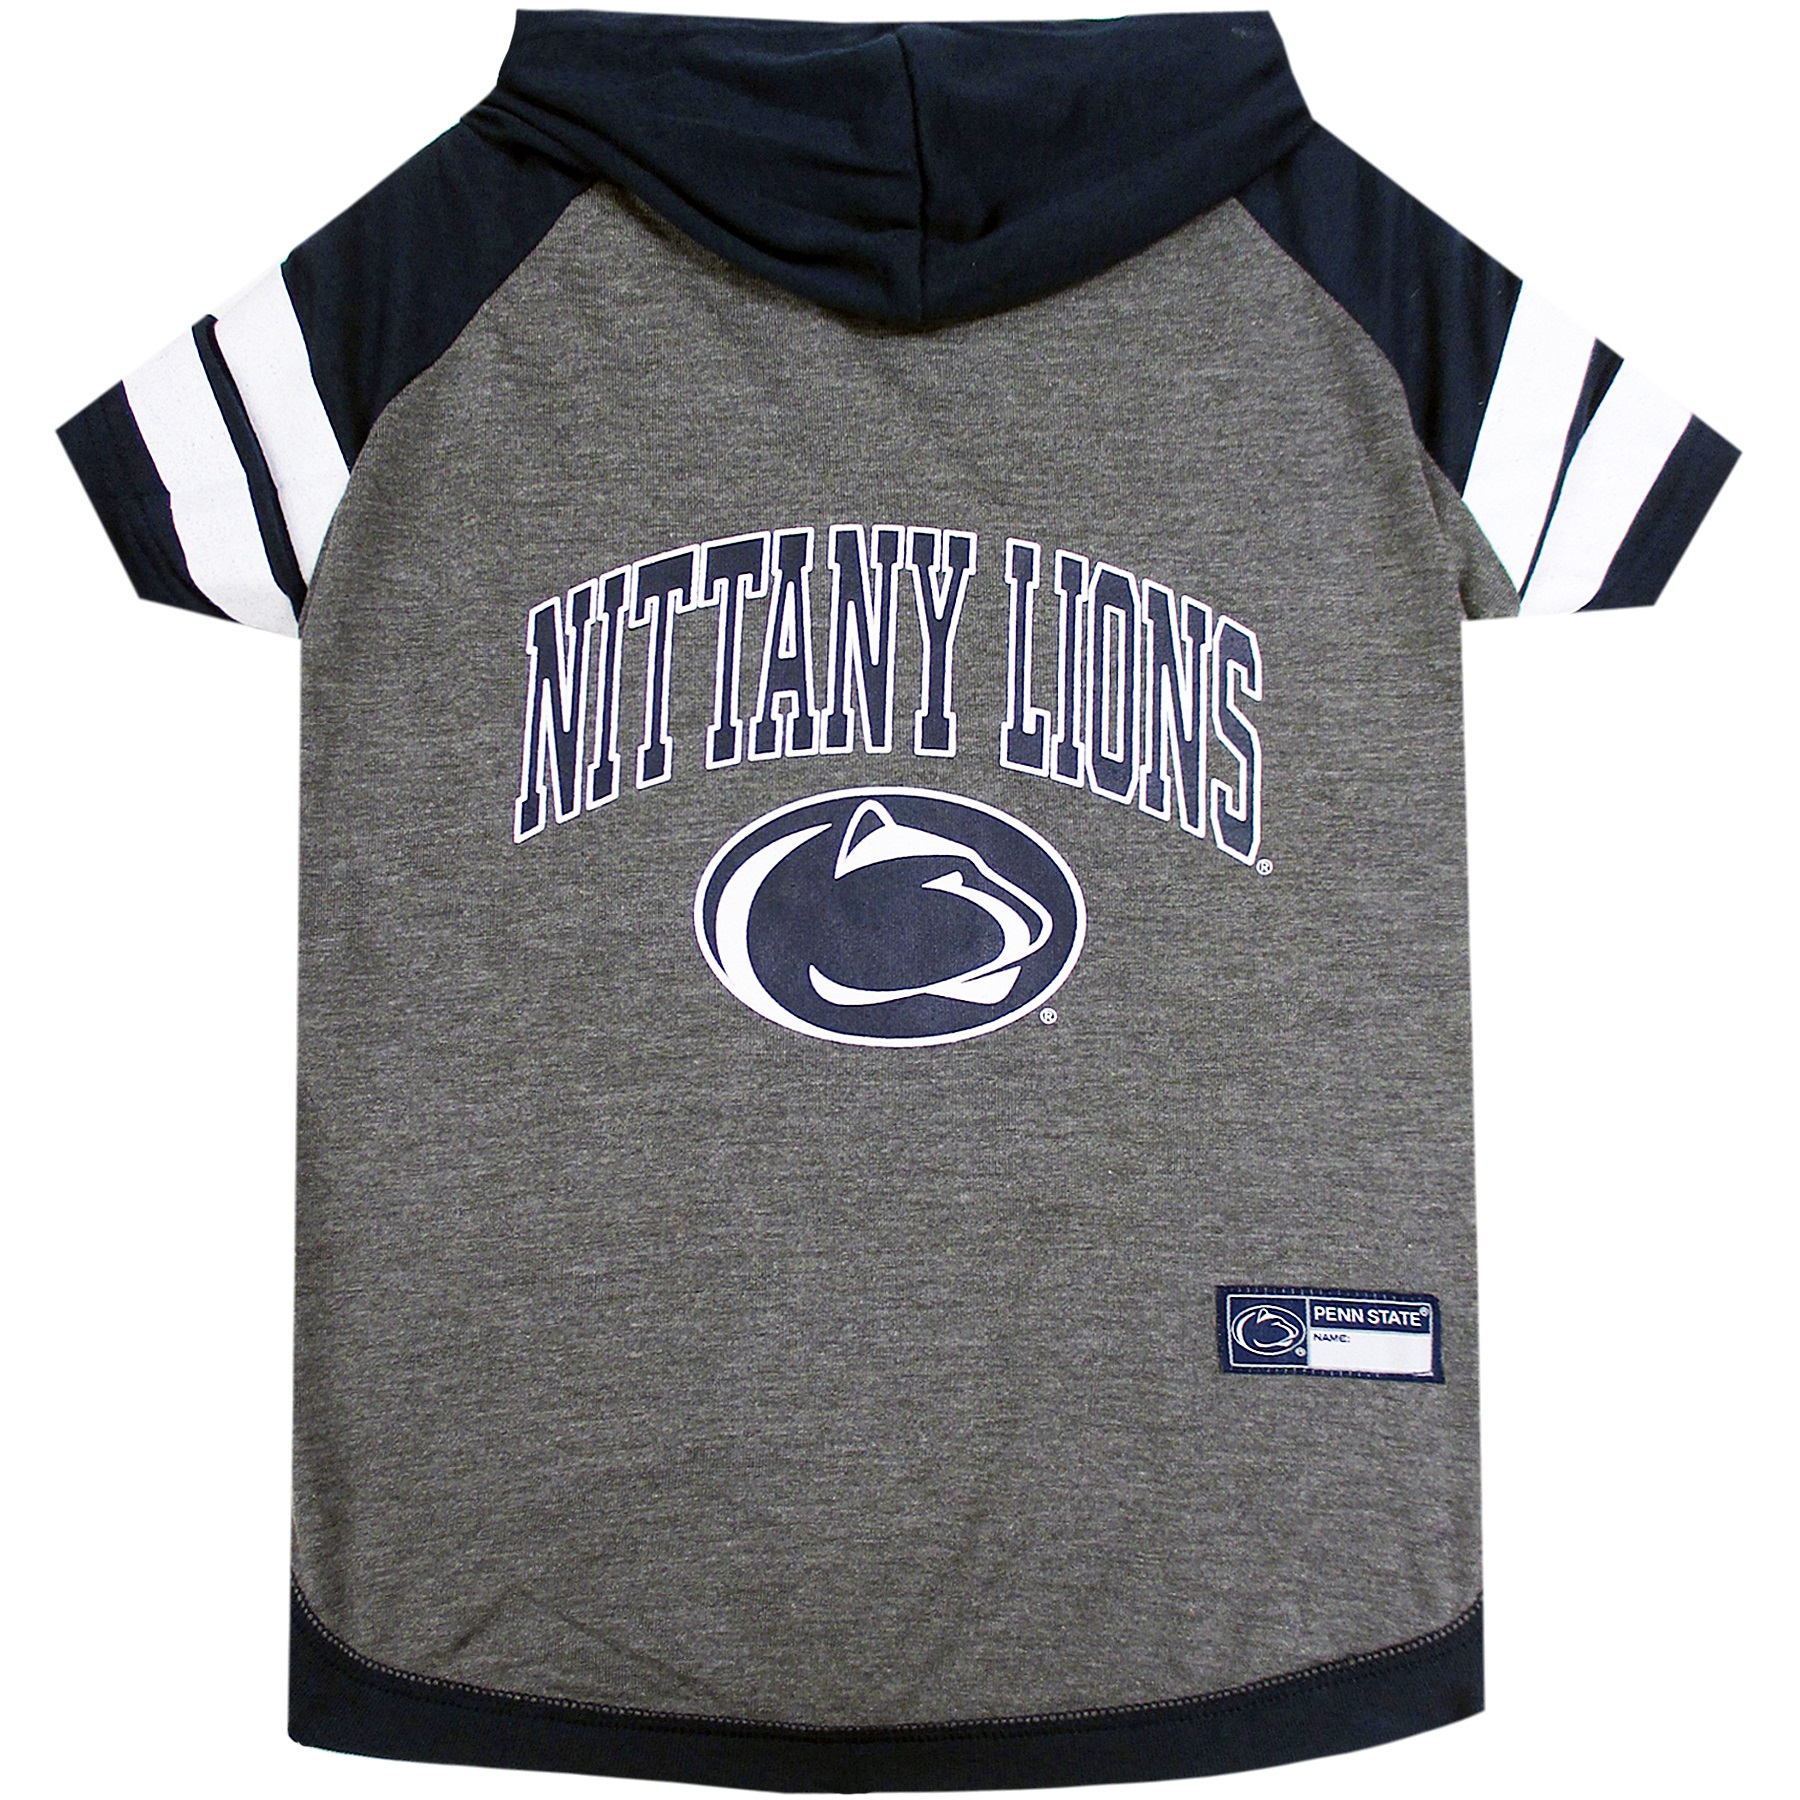 Penn State University Doggy Hooded Tee-Shirt